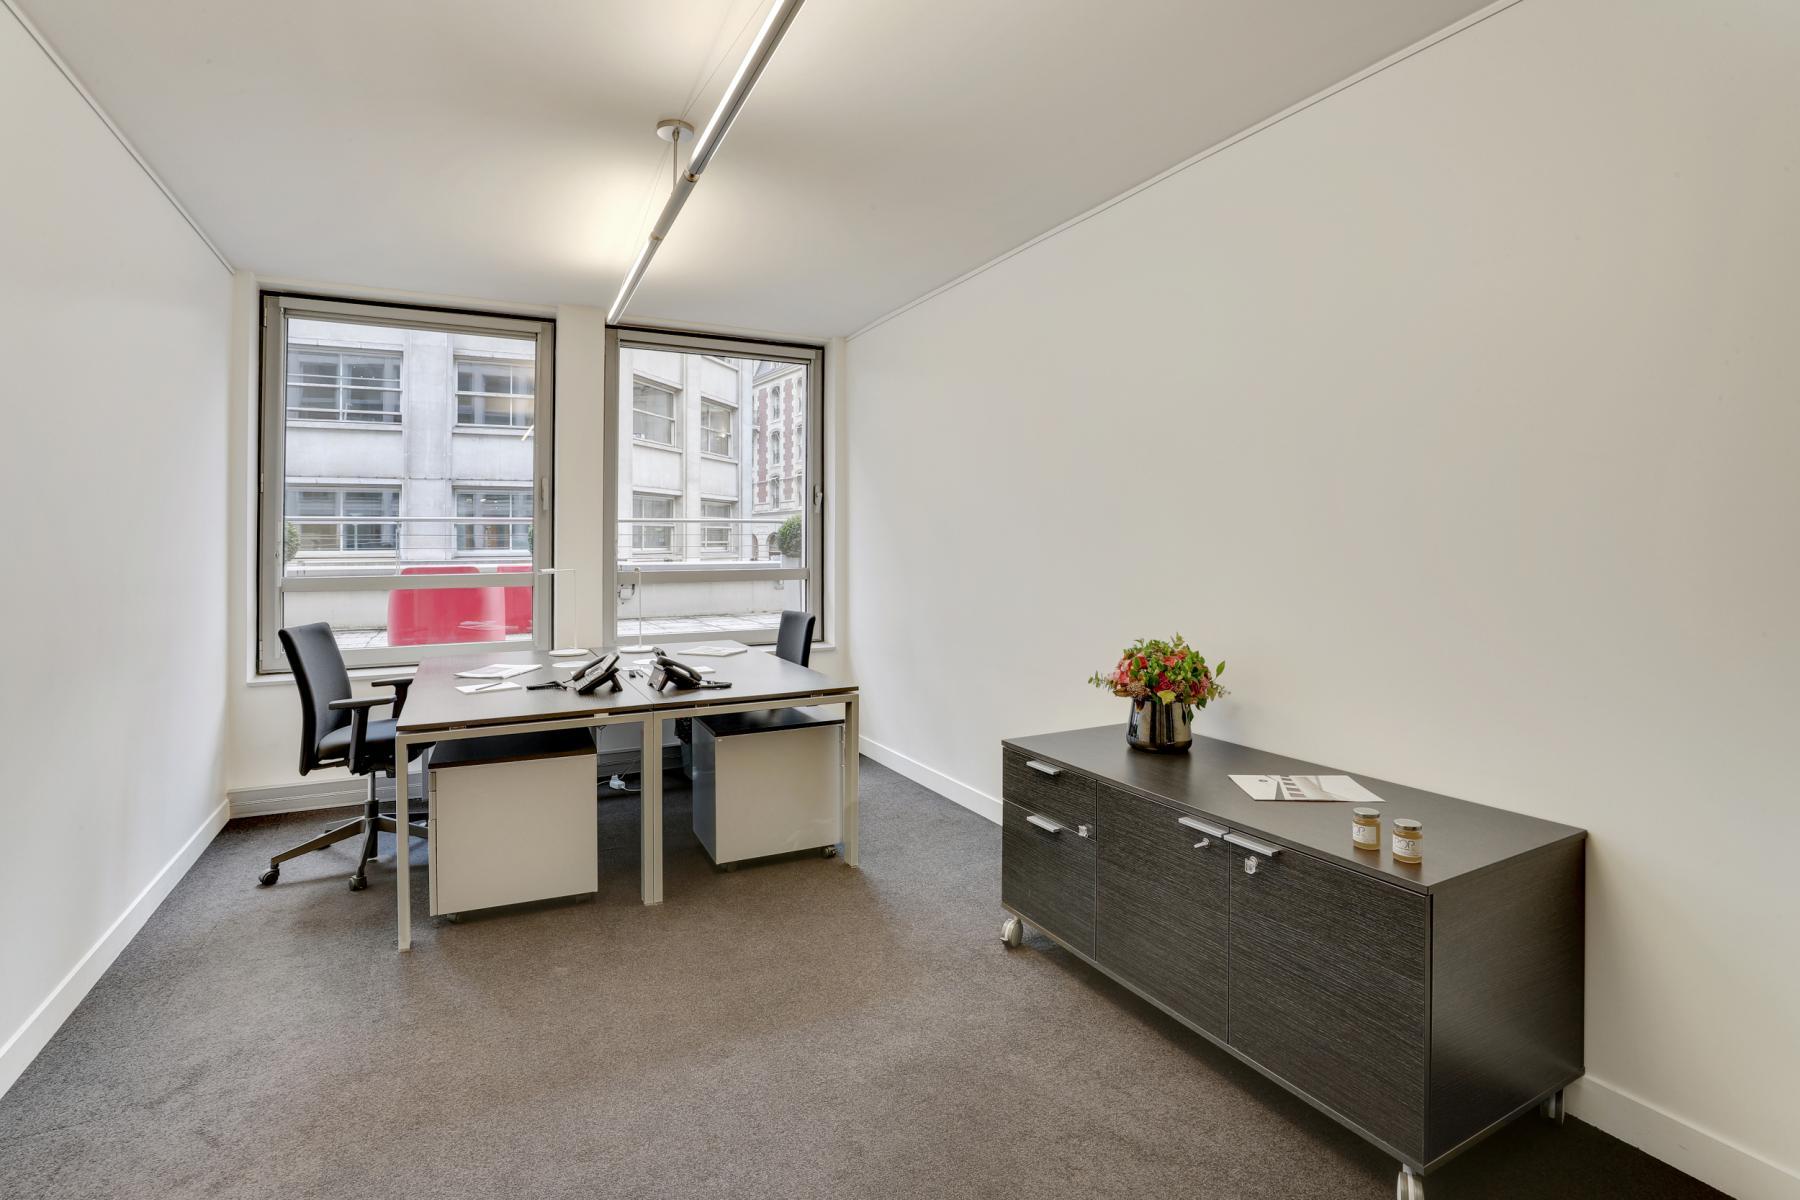 Location bureau Rue Quentin-Bauchart 20, Paris (7)